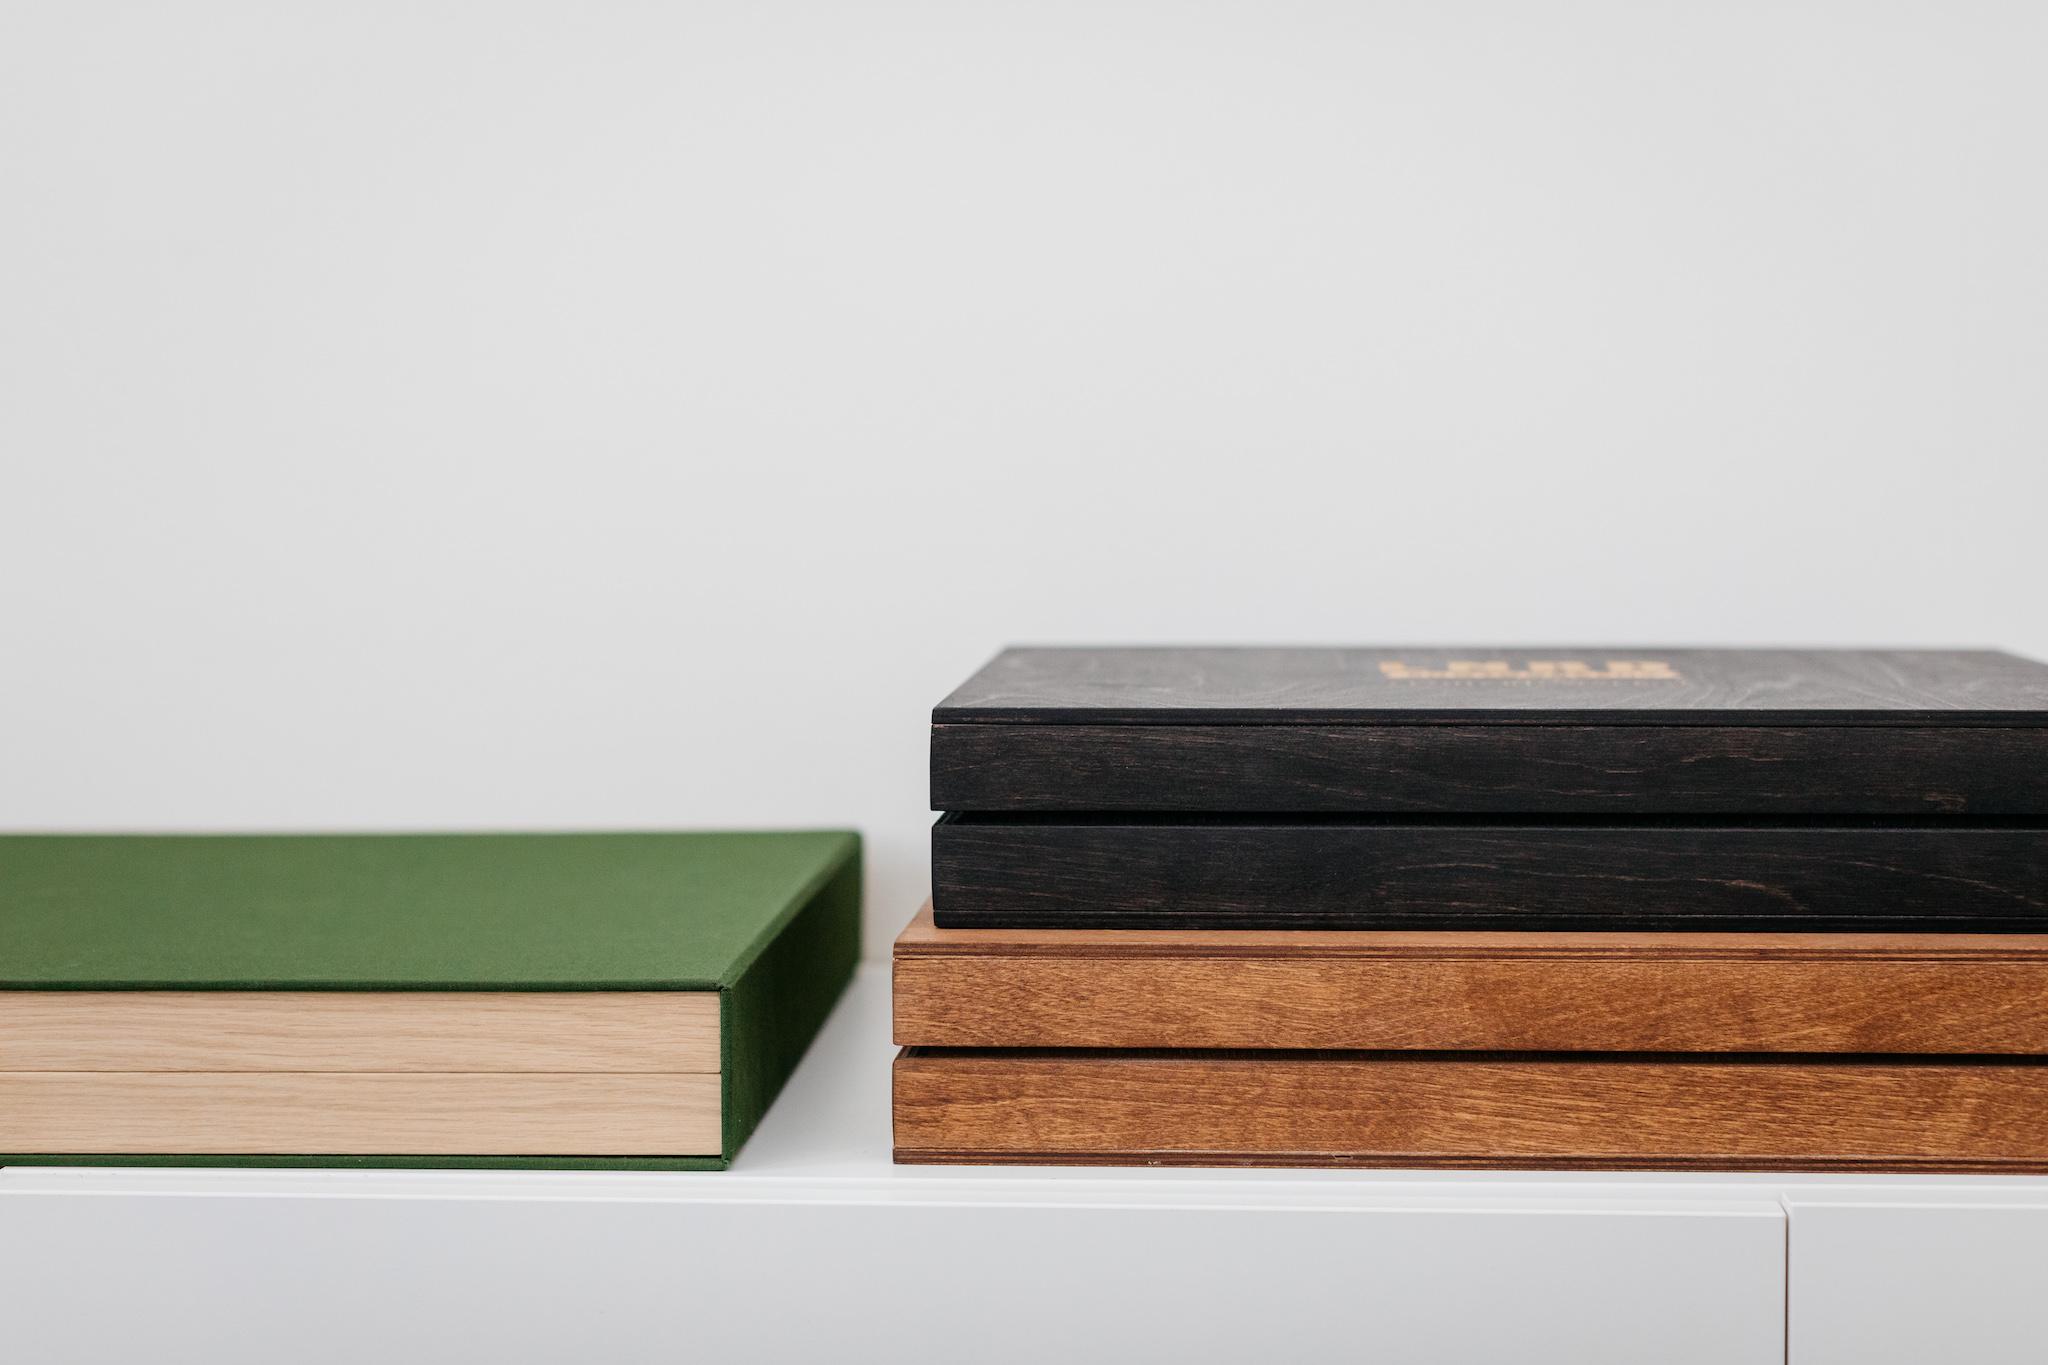 bruidsfotograaf - albums met houten box